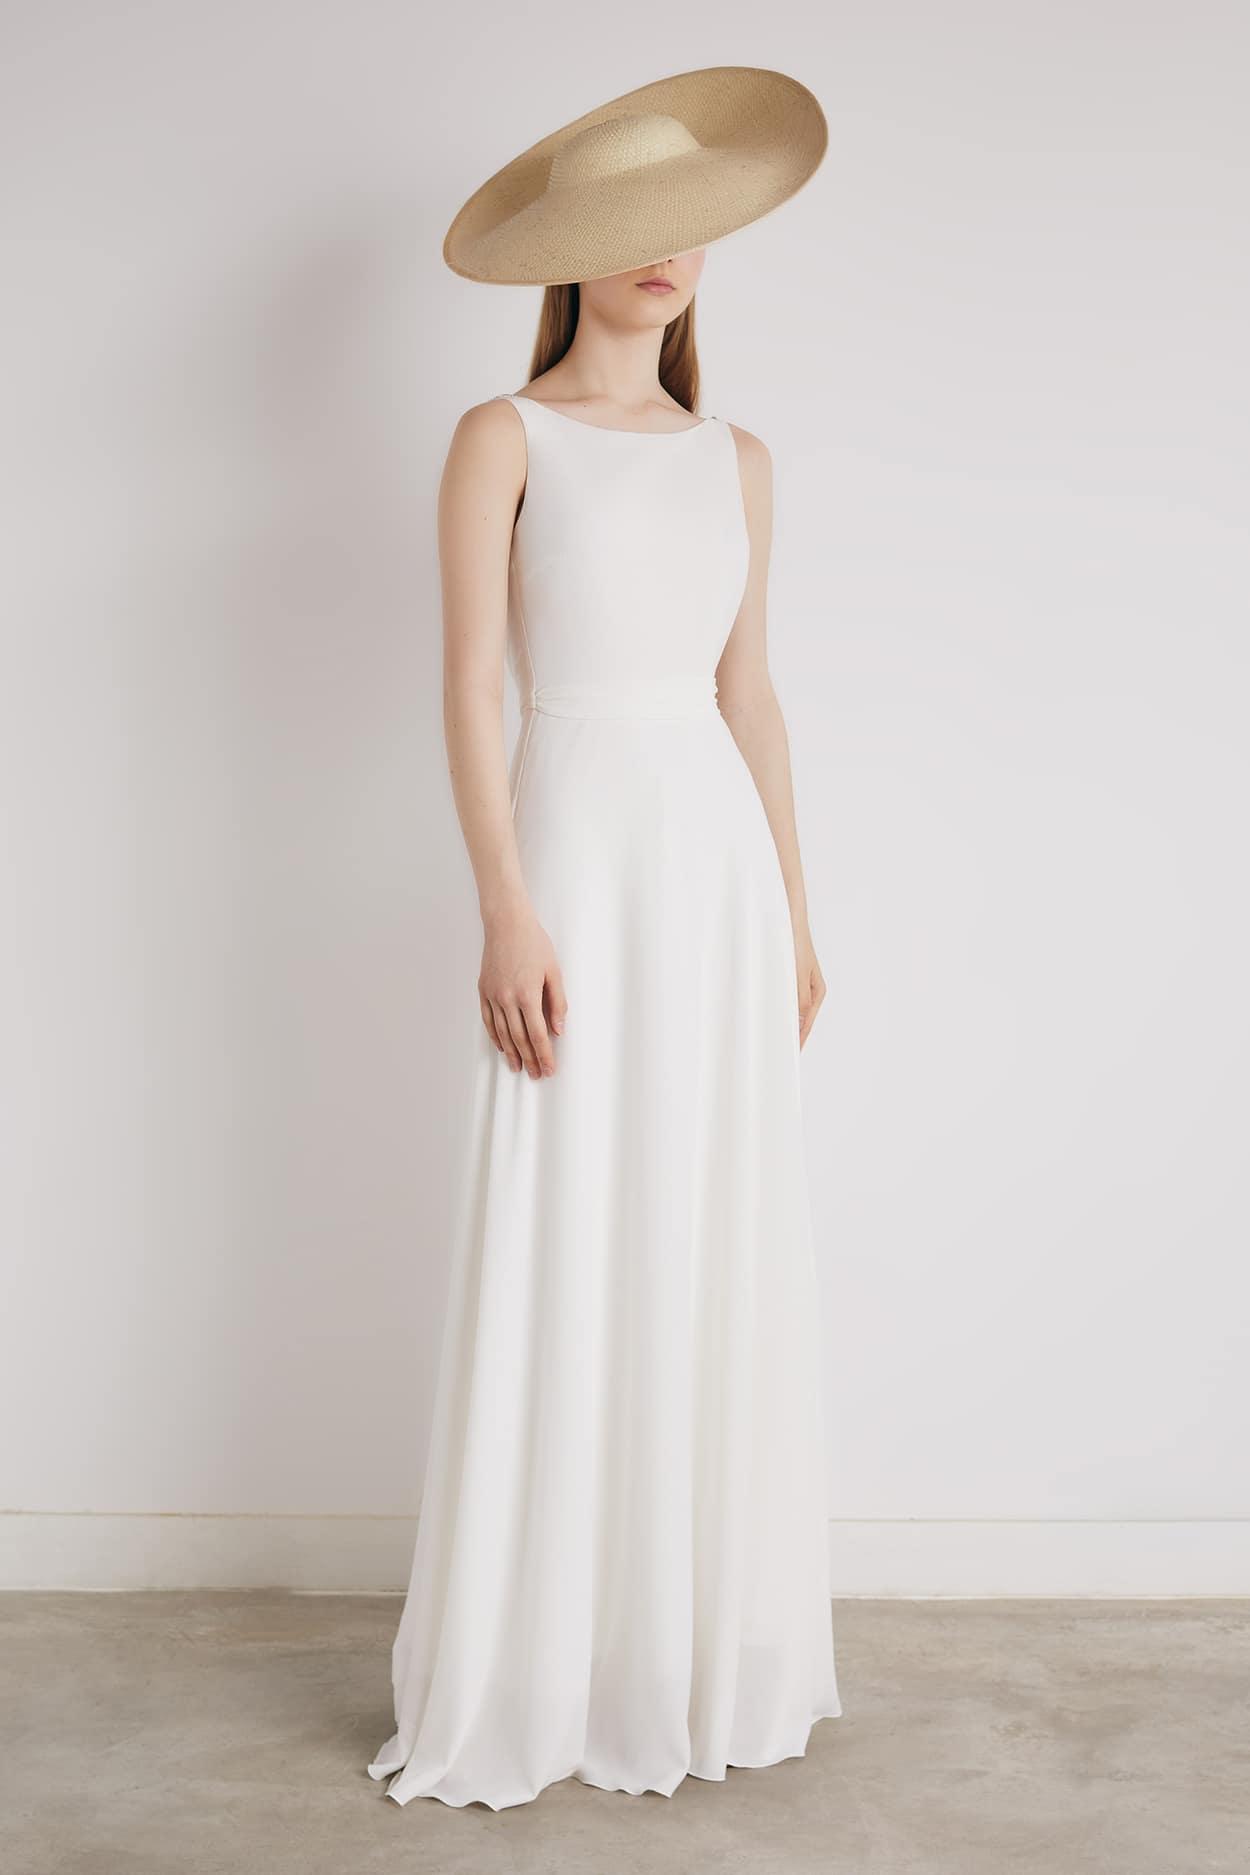 vestido-blanco-novia - Etxart Panno7305 copia